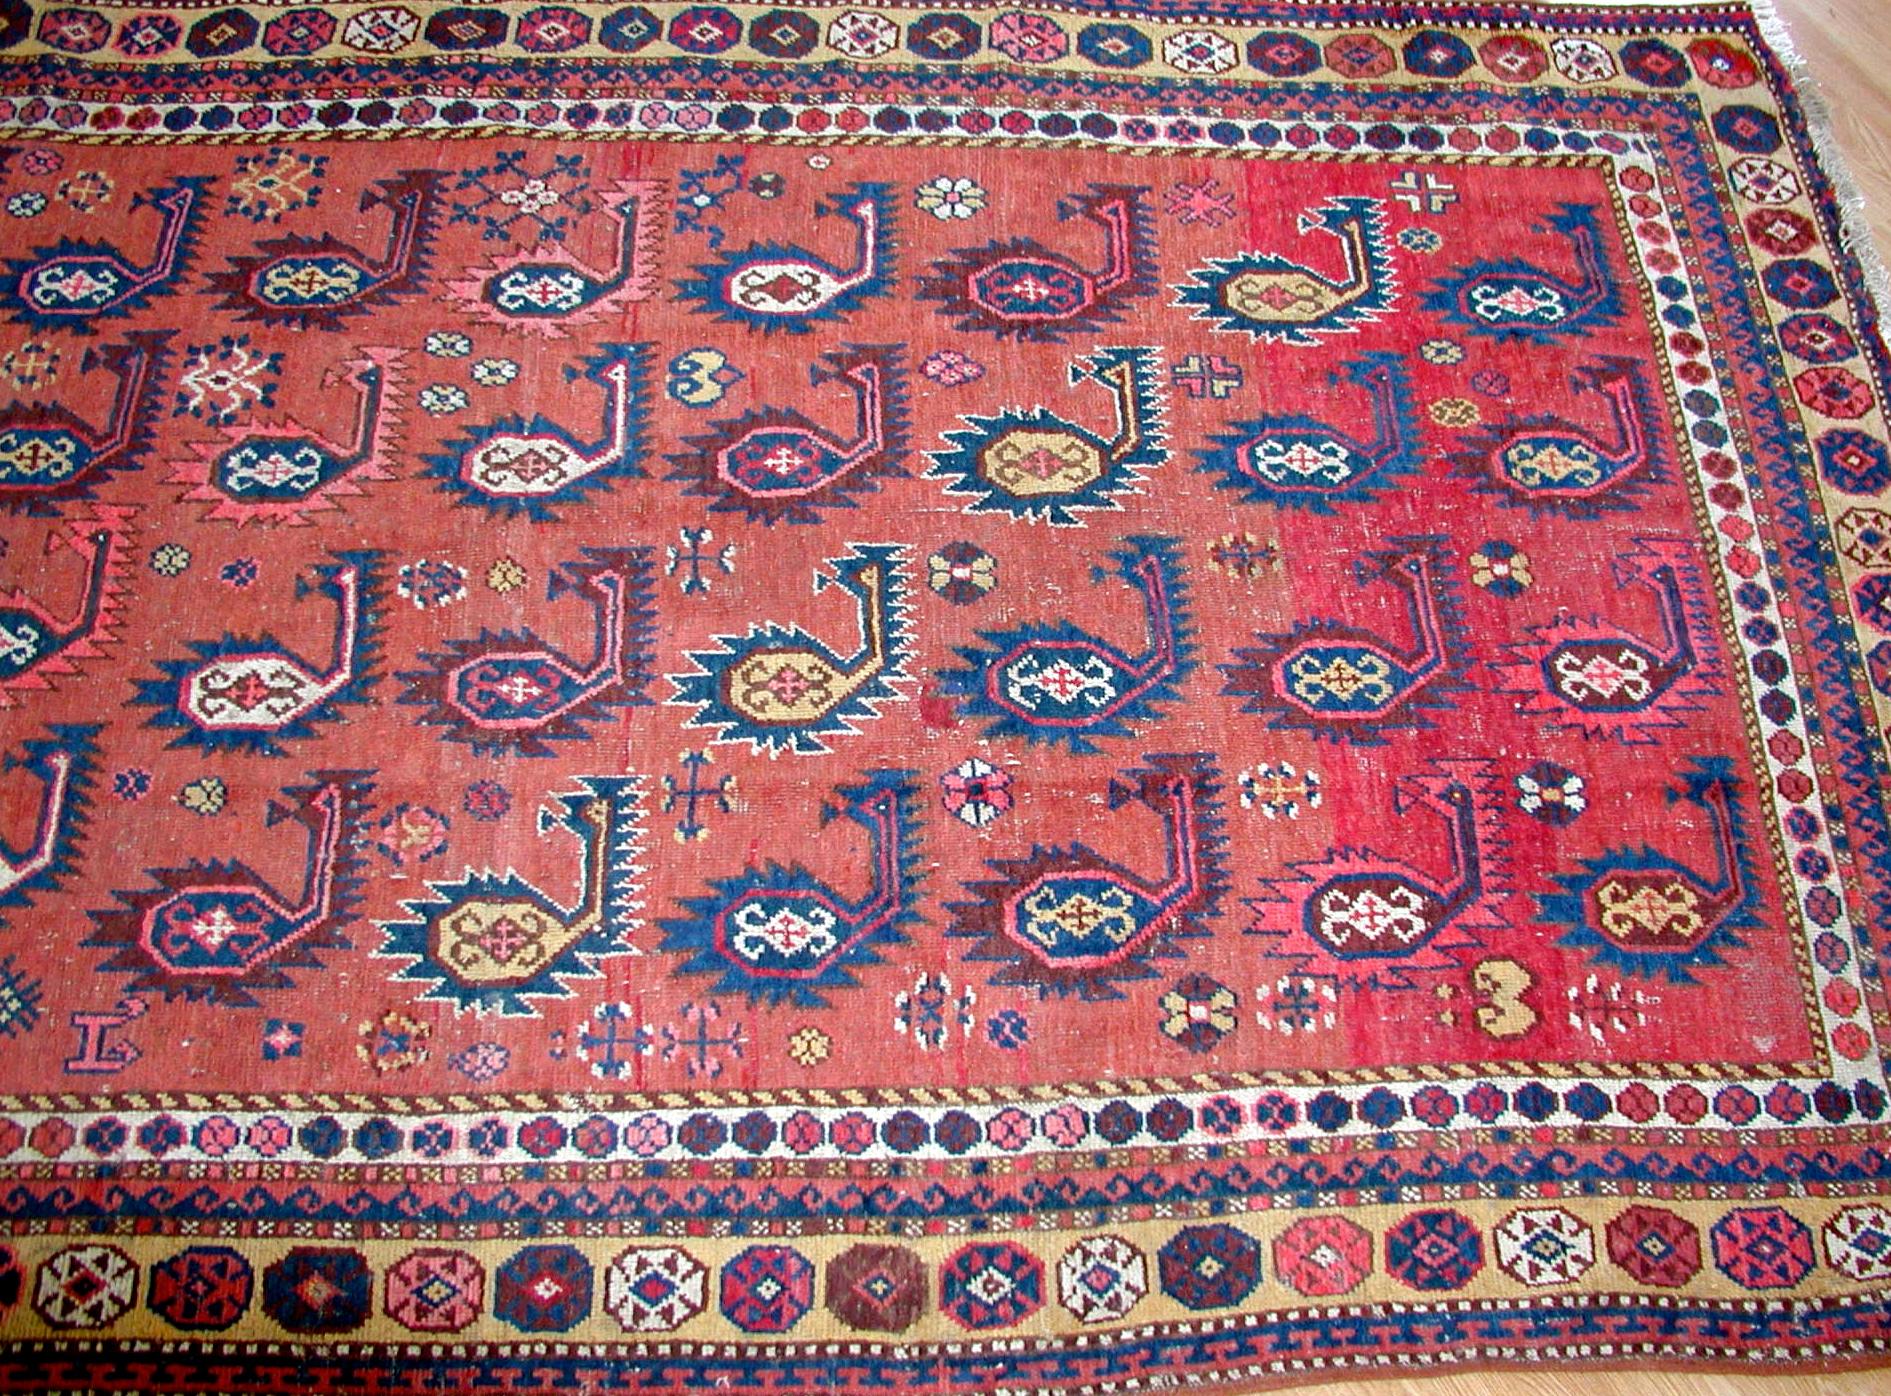 Antique Kyrgyz Carpet Experience